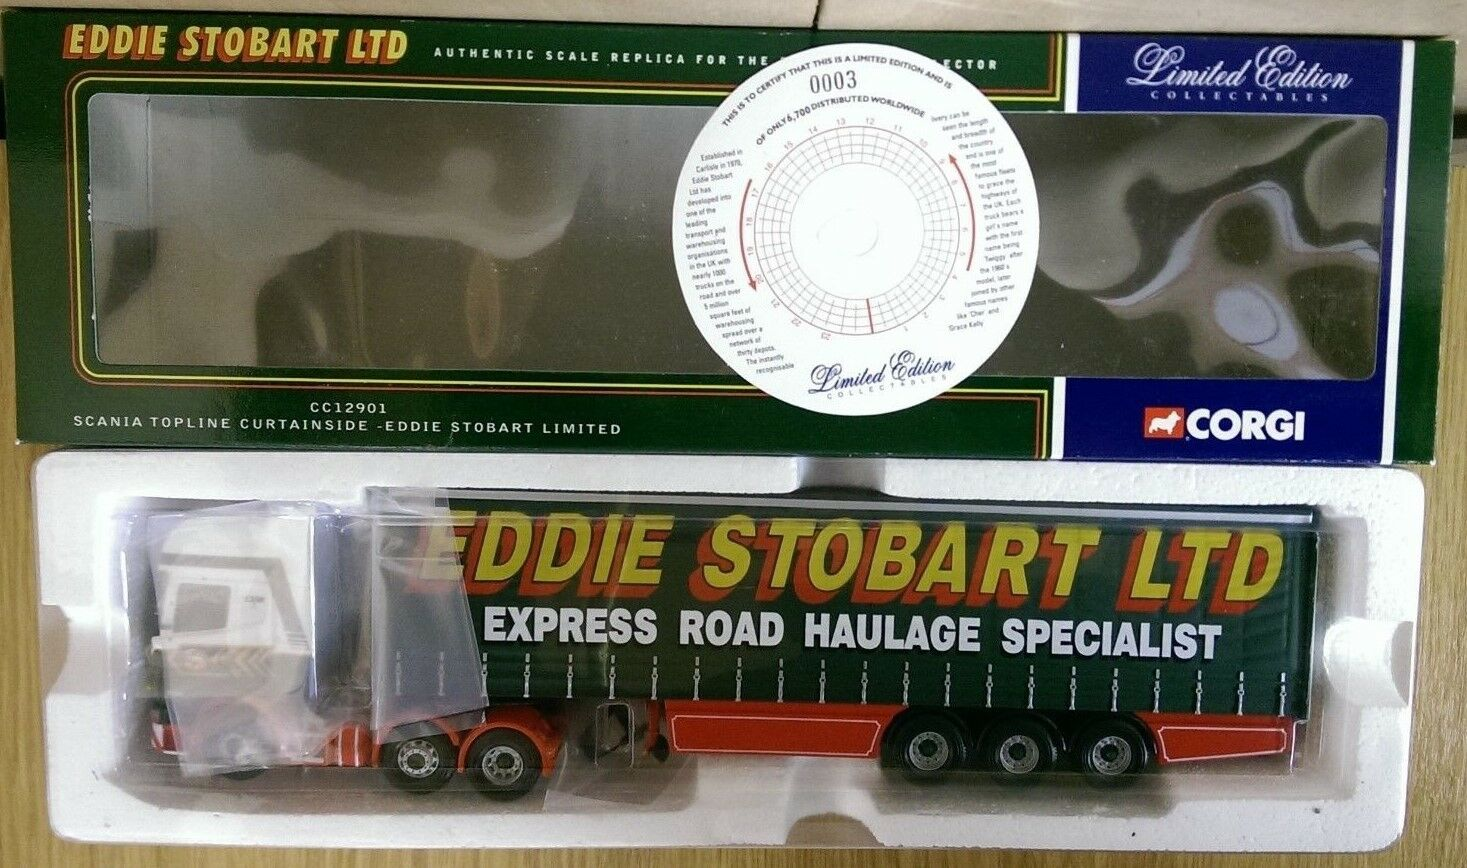 Corgi CC12901 Scania Topline Curtainside Eddie Stobart Ltd Ed No. 0003 of 6700